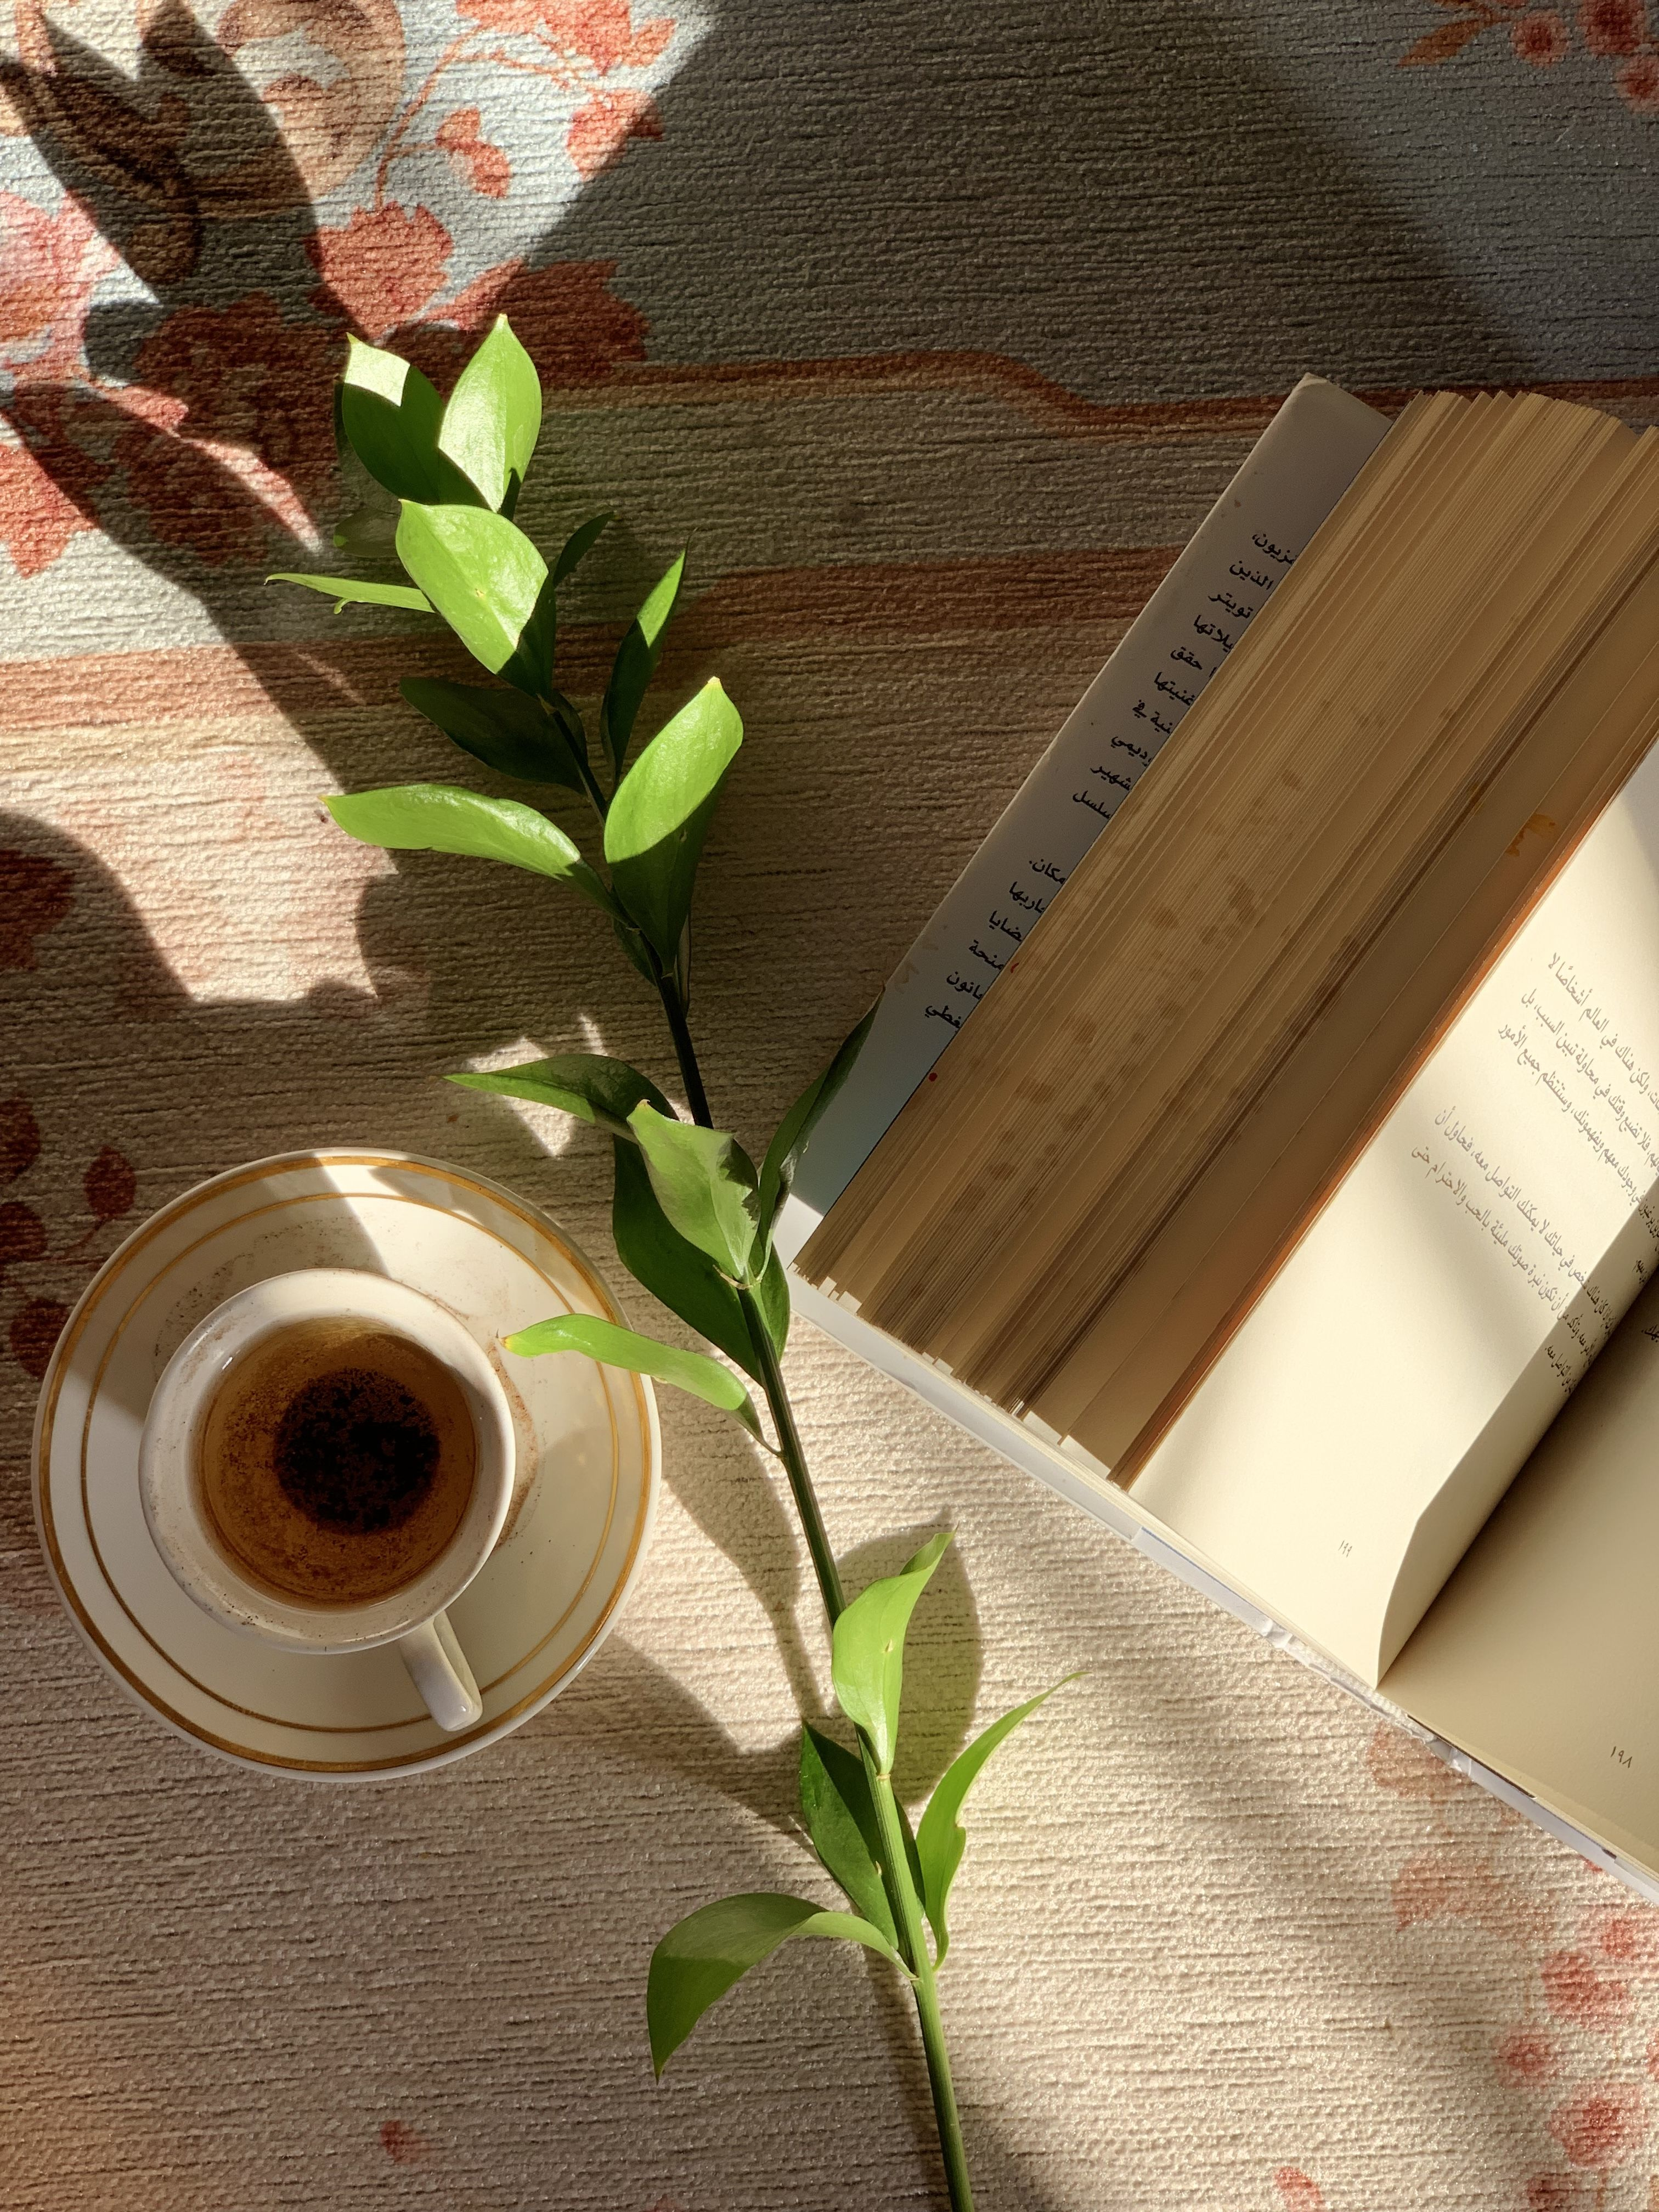 كتاب وقهوة Cinnamon Sticks Spices Glassware